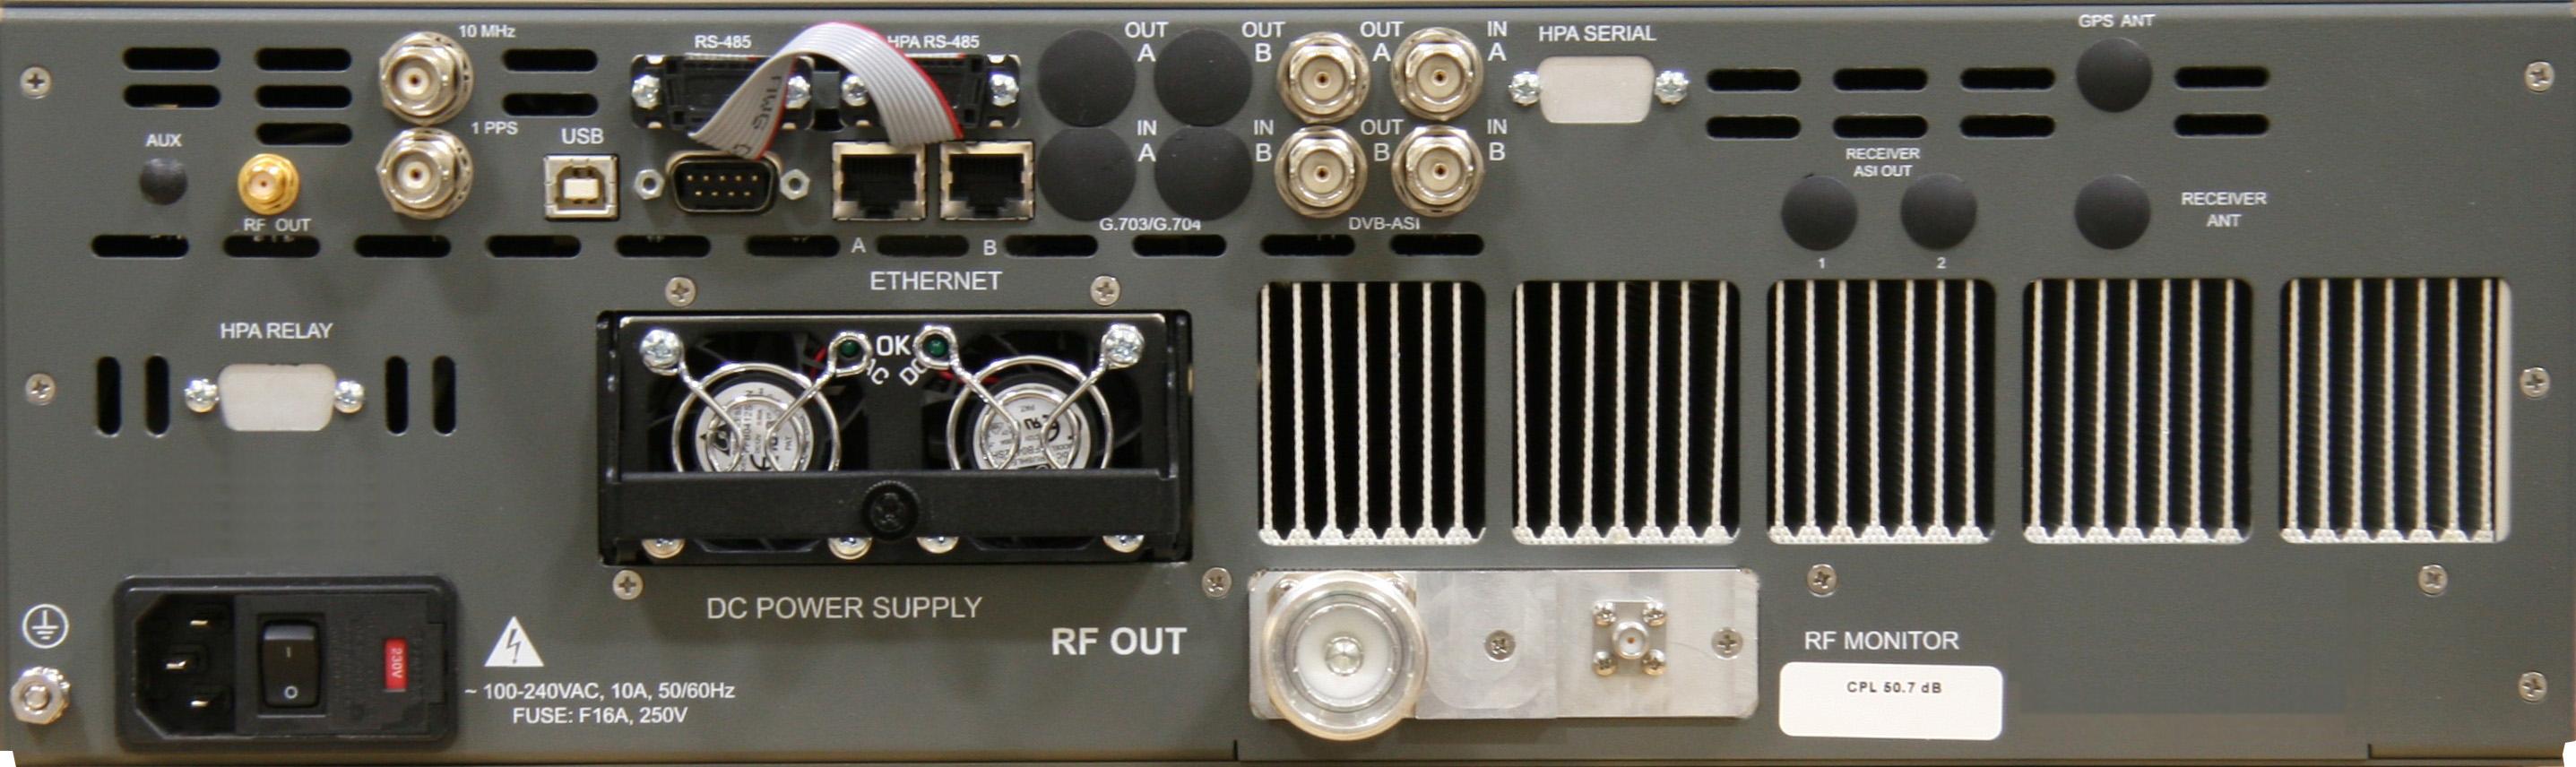 Uhf Transmitter Repeater 120 Watt Unique Broadband Systems Preamplifier 120w Rear Panel